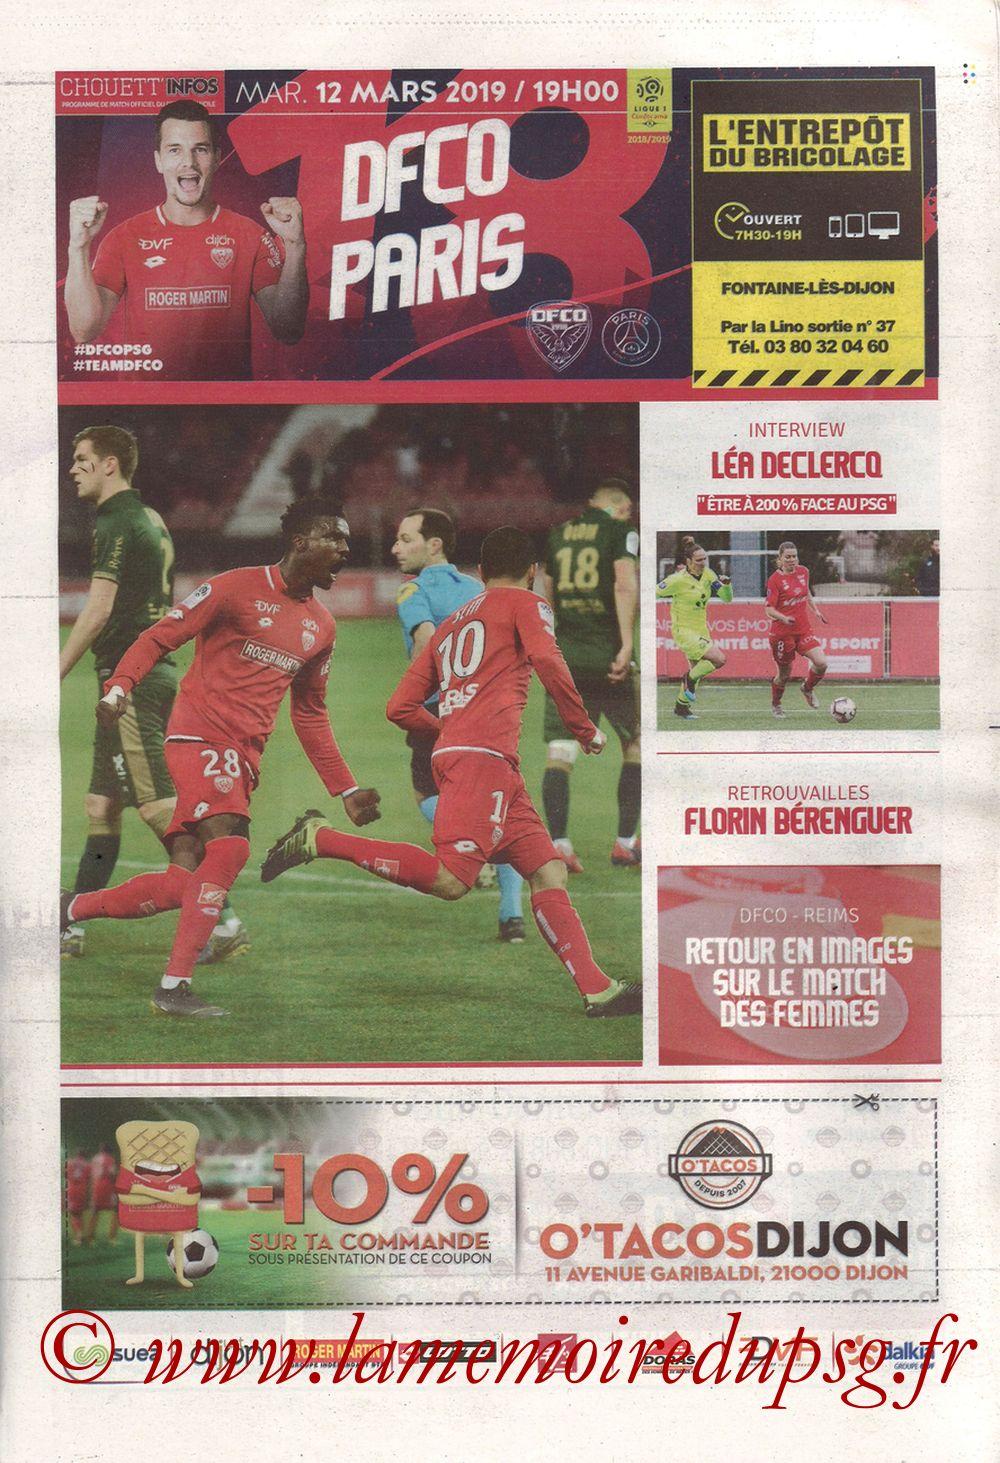 2019-03-12  Dijon-PSG (18ème L1 en retard, Chouett'Infos)